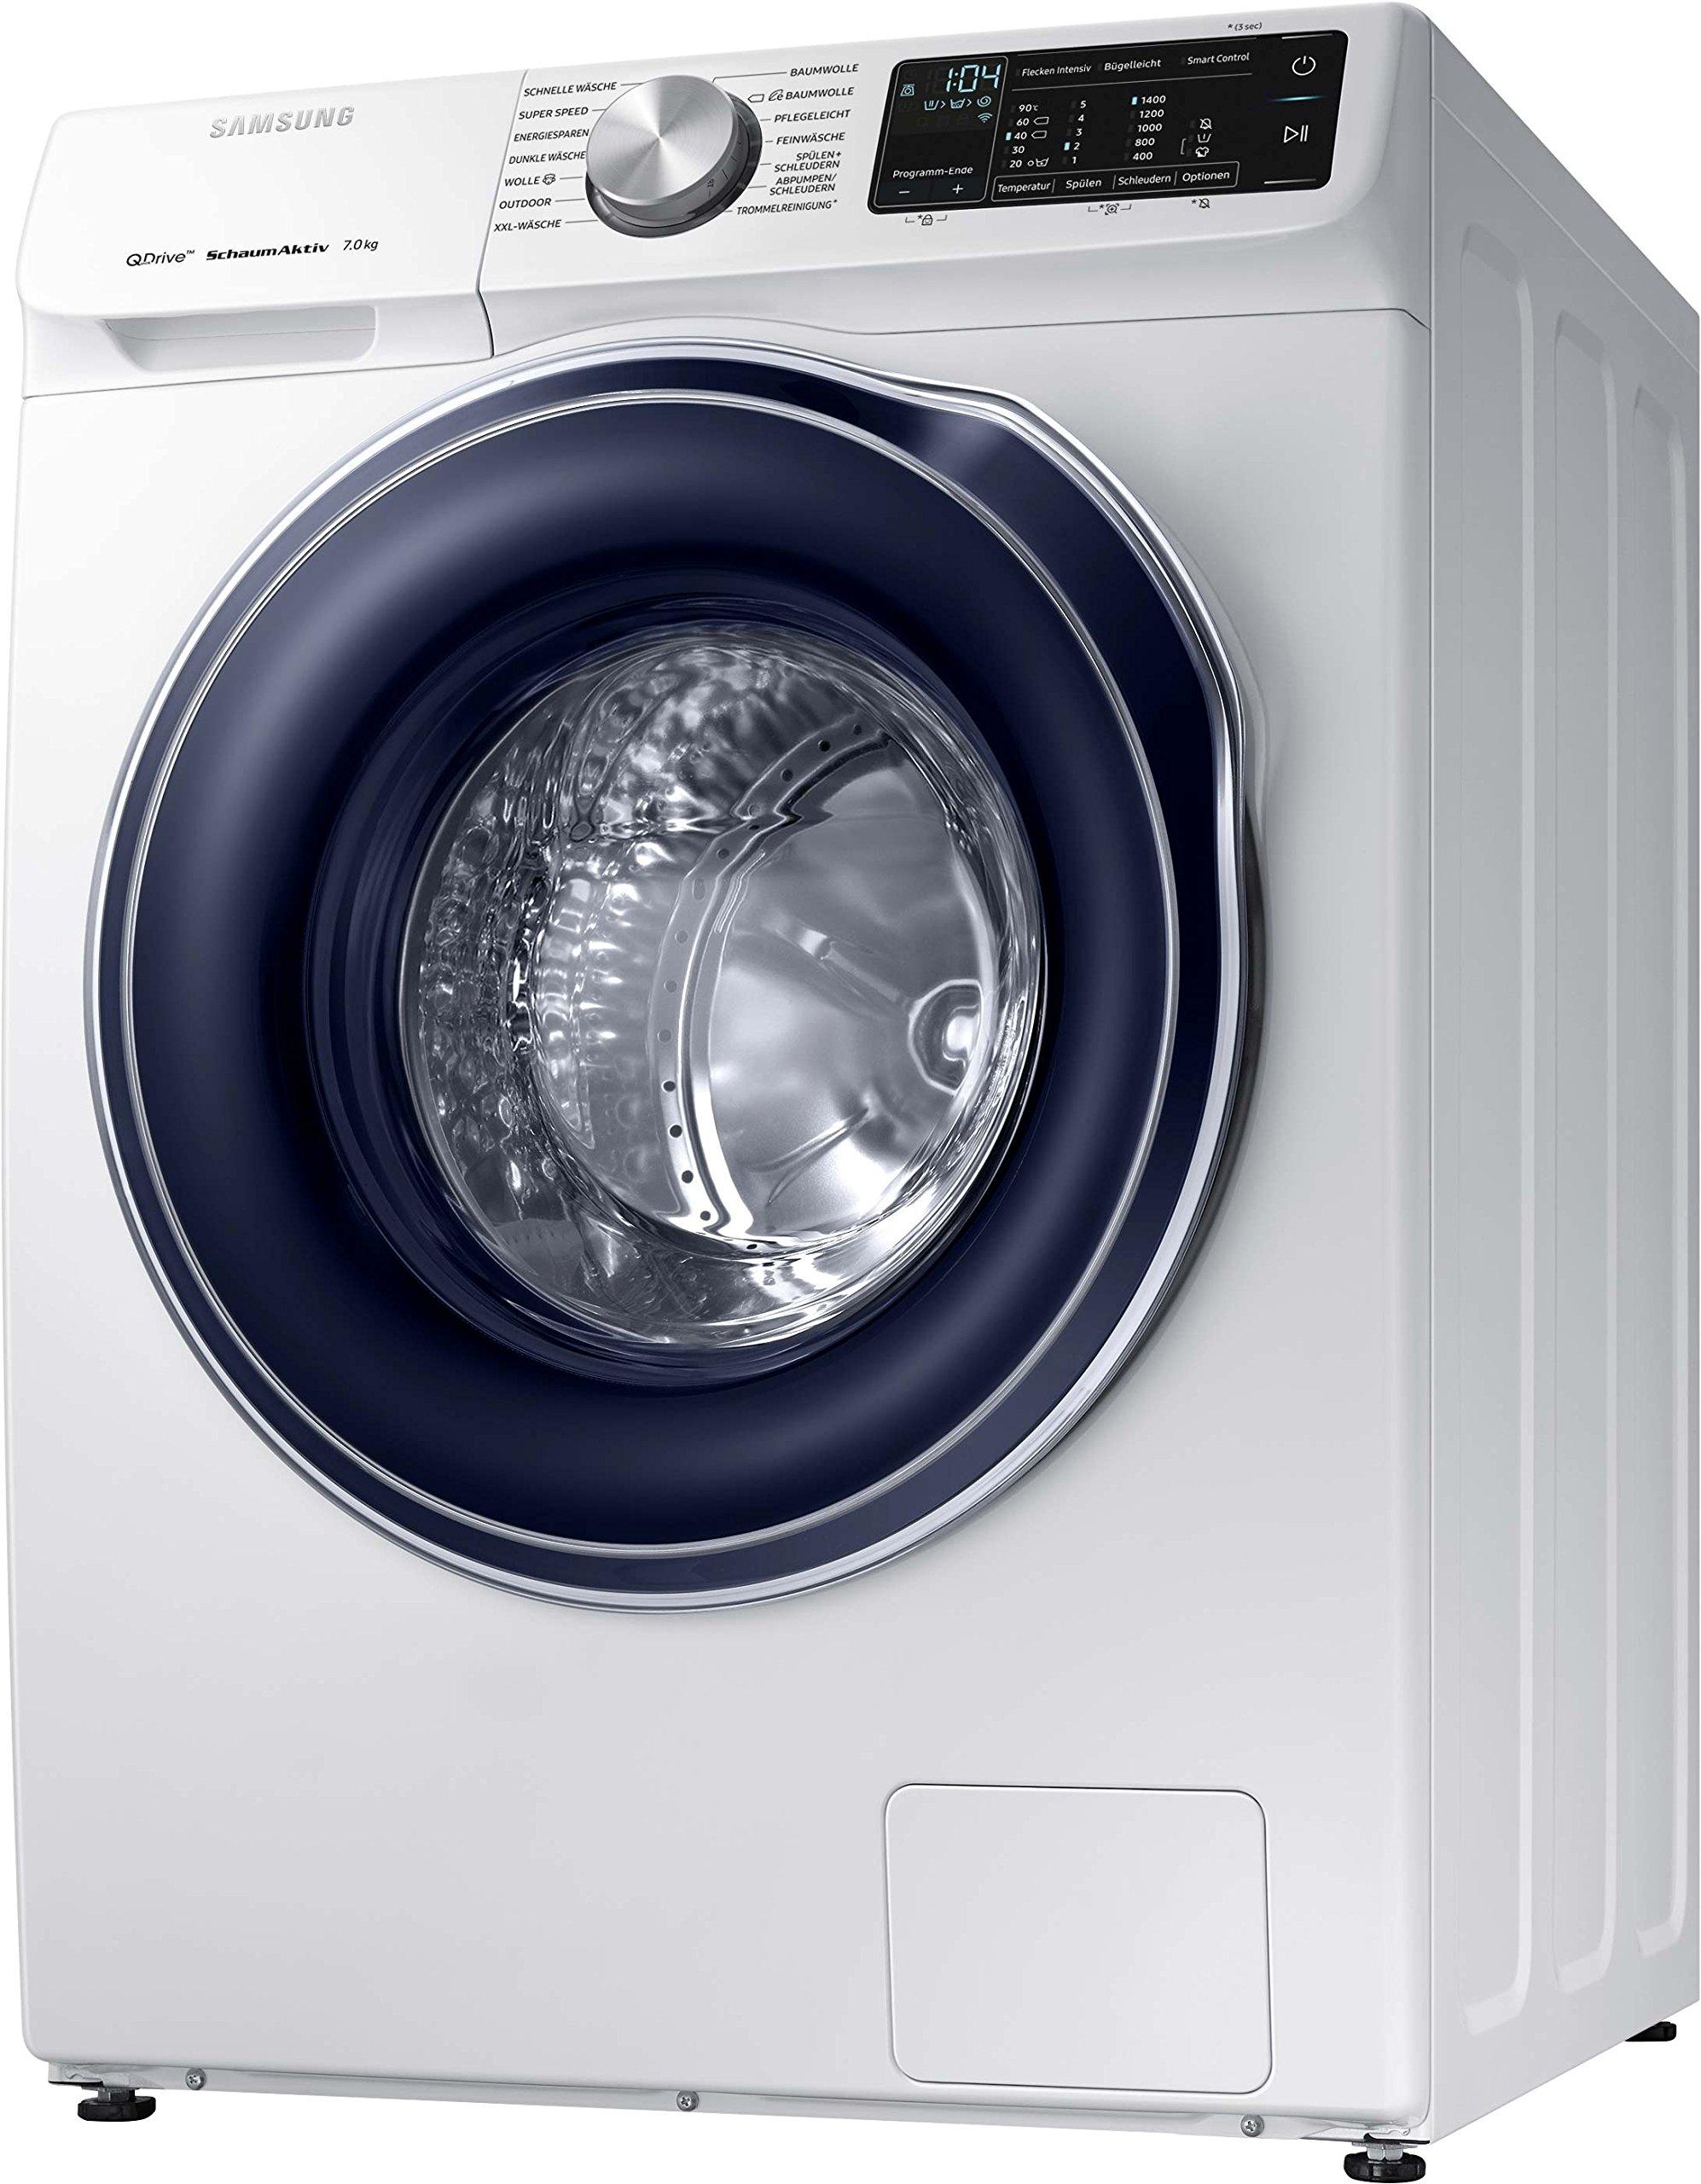 Samsung-WW6600-WW70M642OBWEG-Waschmaschine-Frontlader-1400Umin-QuickDrive-Technologie-SchaumAktiv-Technologie-Wei-Amazon-Dash-Replenishment-fhig